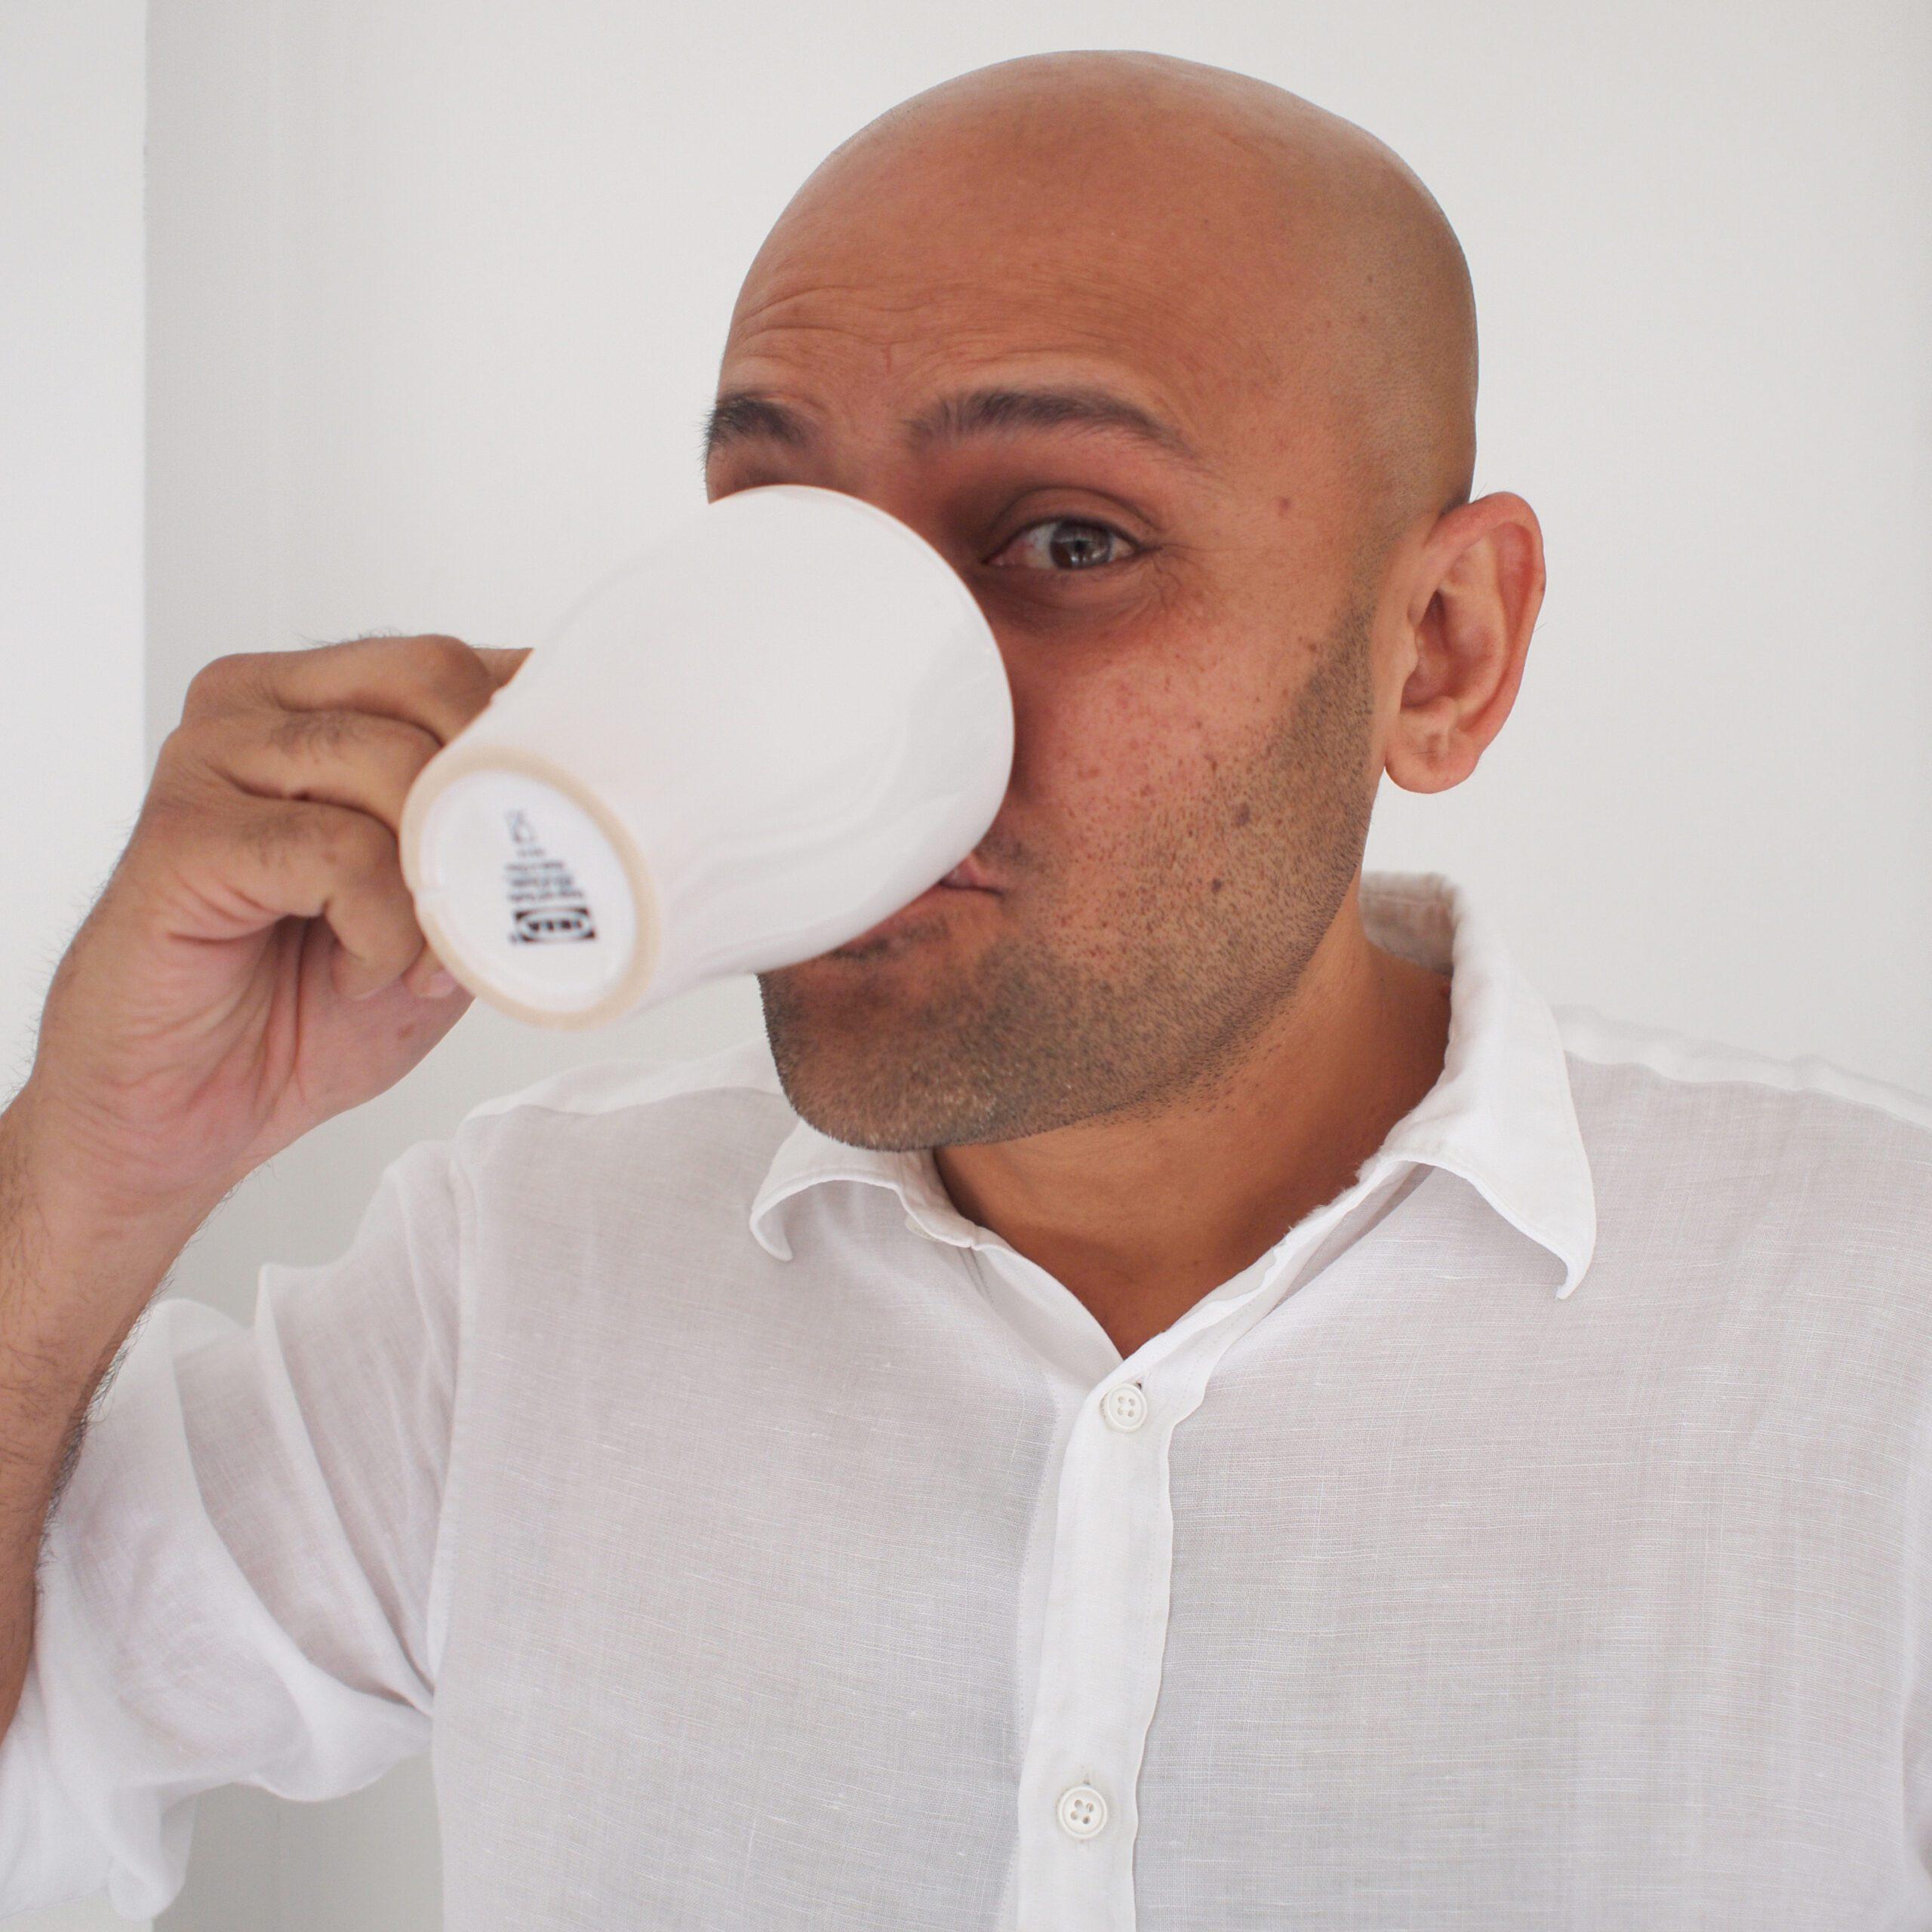 Rupen Desai, global CMO, Dole